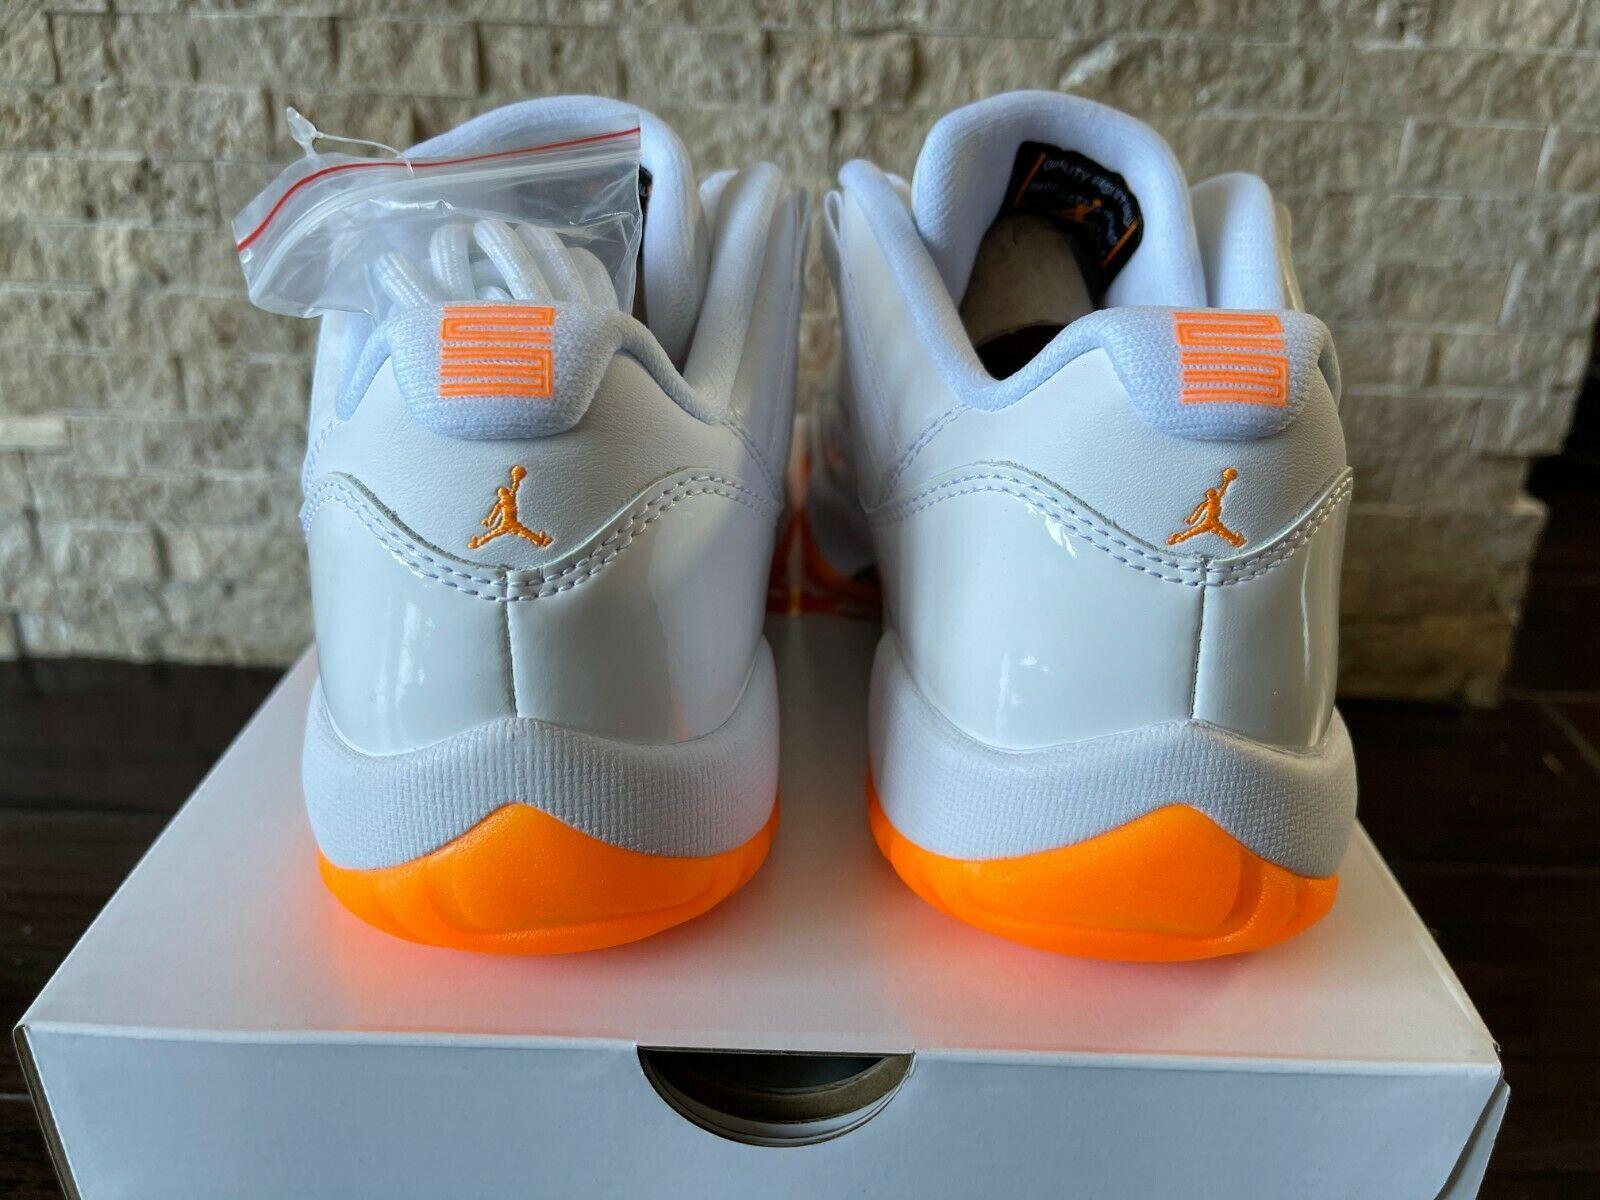 Where To Buy The Air Jordan 11 Low Bright Citrus AH7860-139 & Resale Value